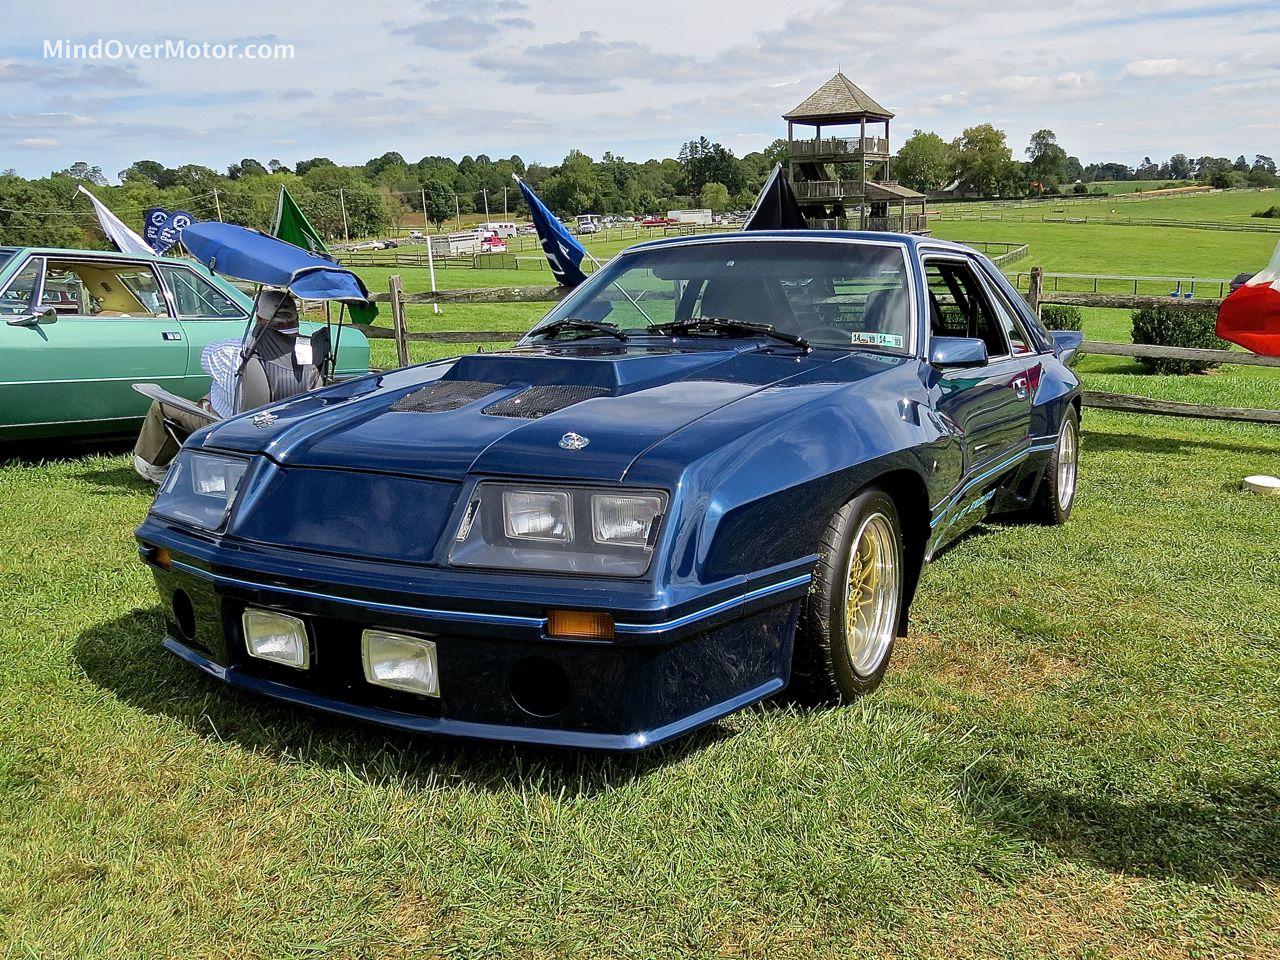 IMSA Mustang Front Angle